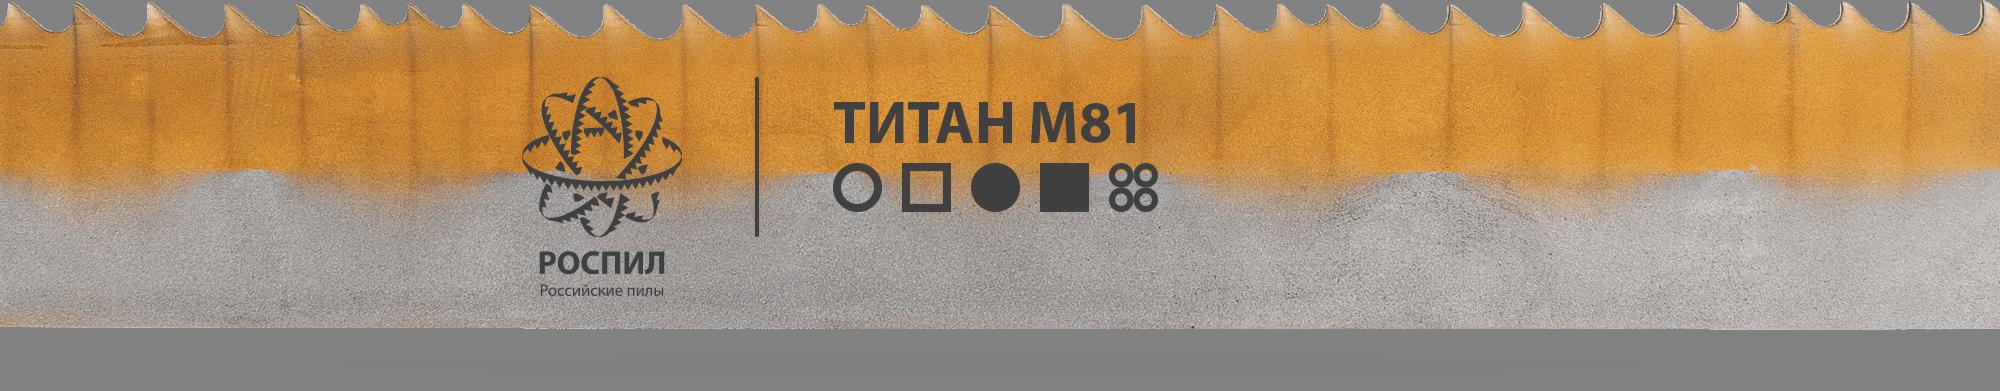 РОСПИЛ ТИТАН М81